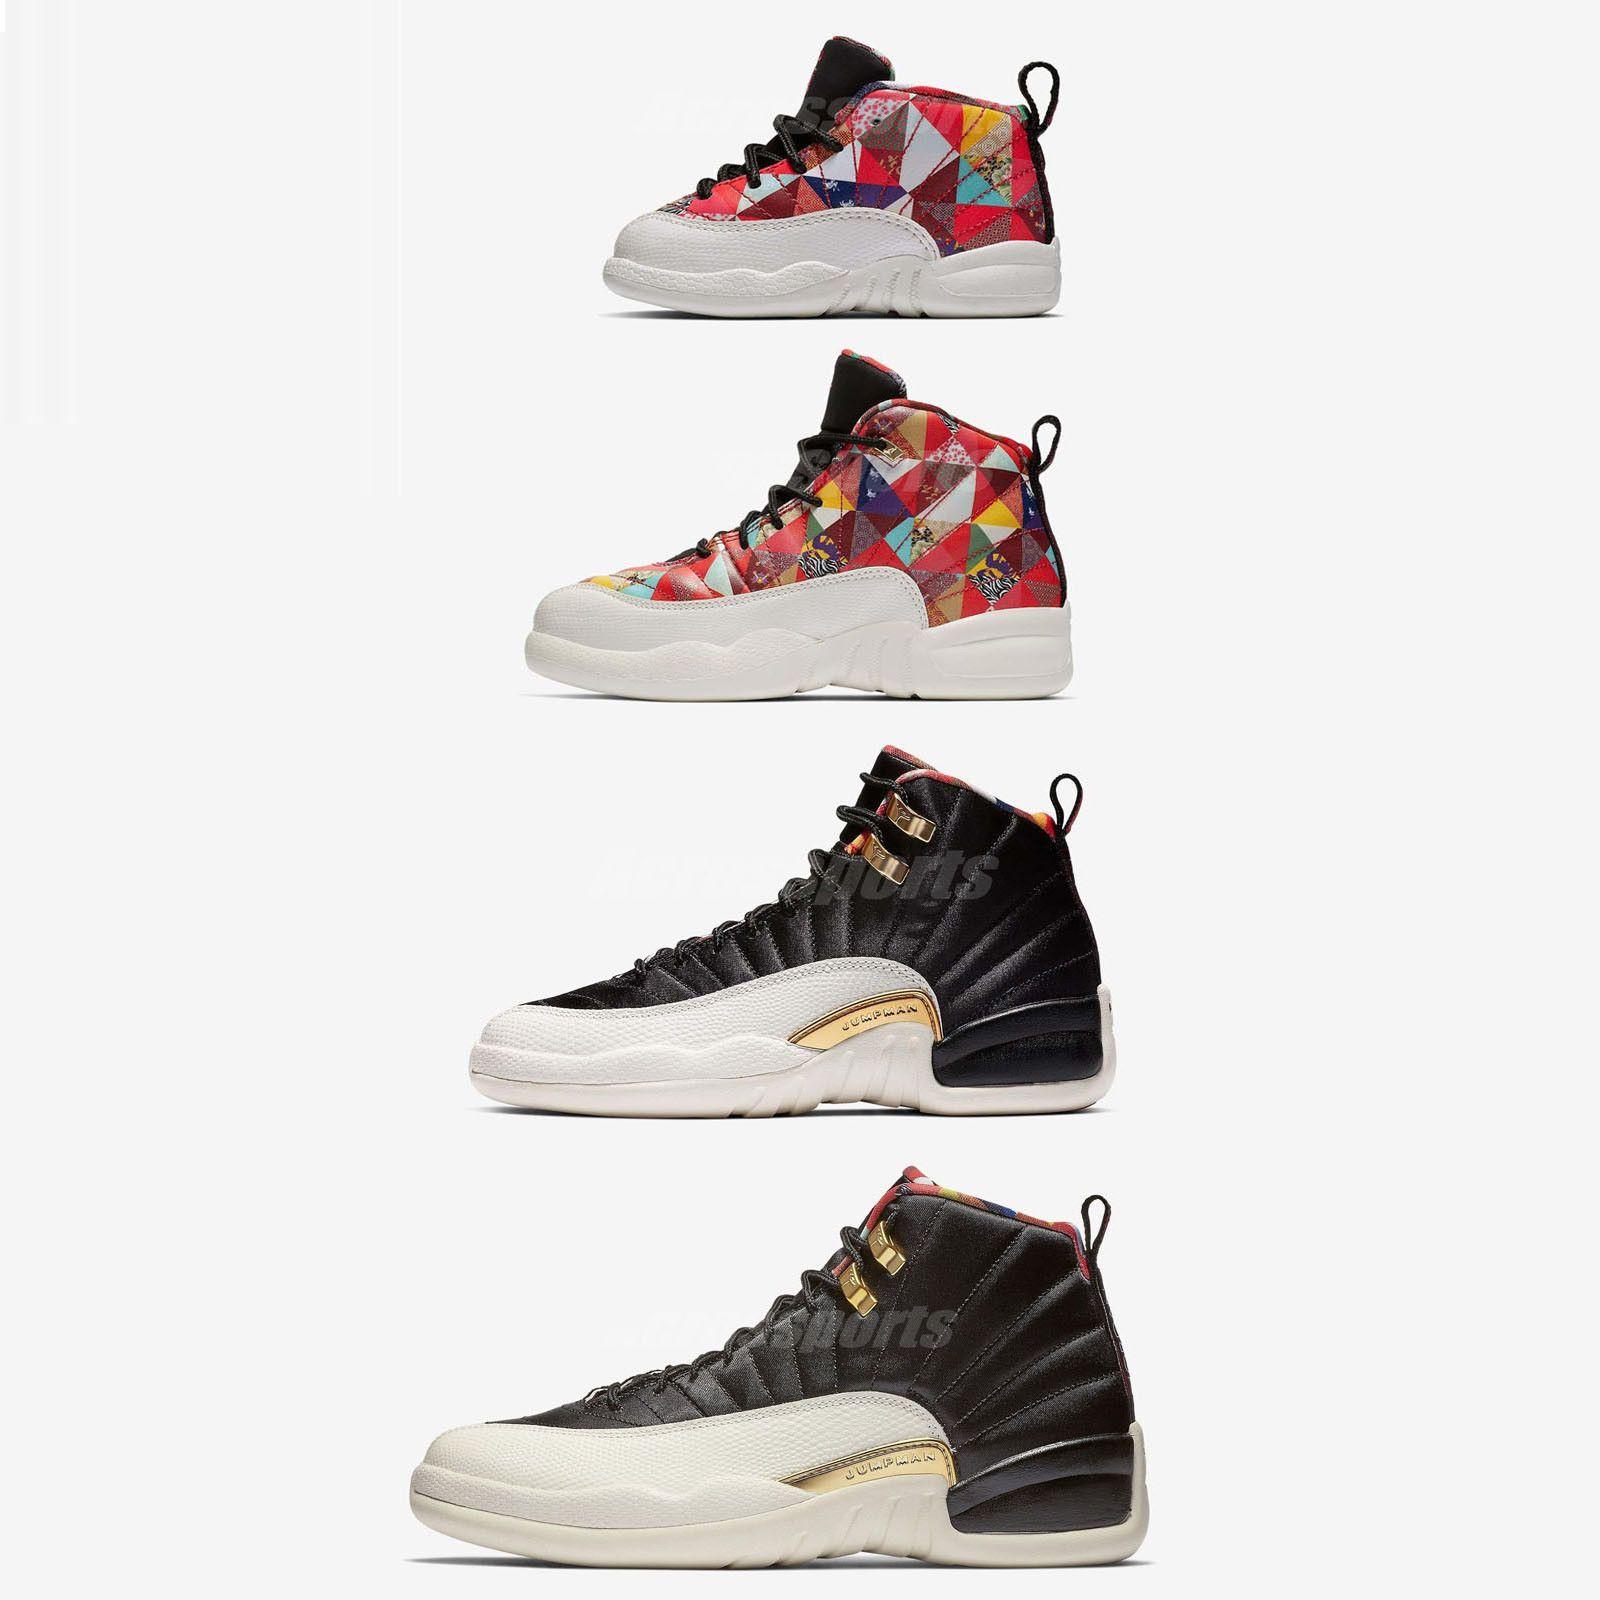 buy cheap fa5ed 3e4e6 Nike Air Jordan 12 Retro CNY XII 2019 Chinese New Year Men Women Kids